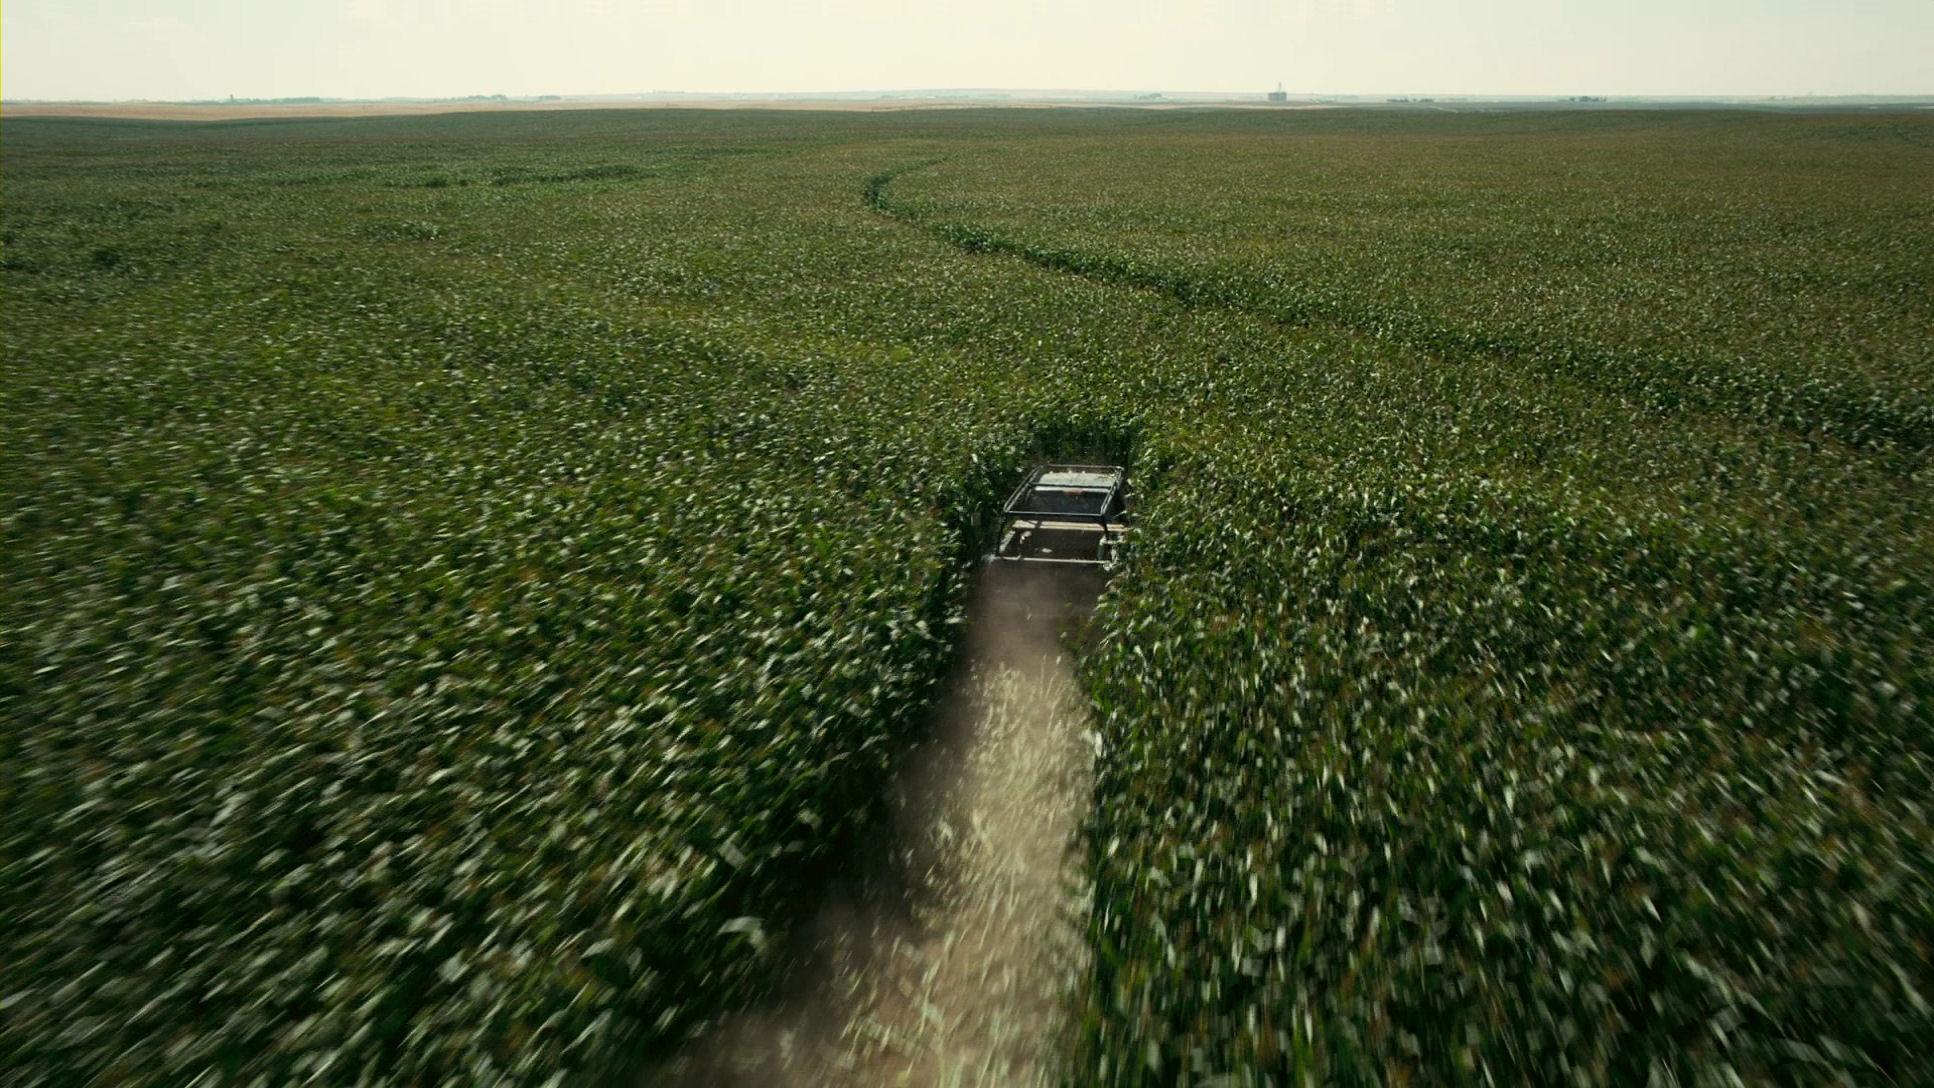 000-car-cornfield.jpg